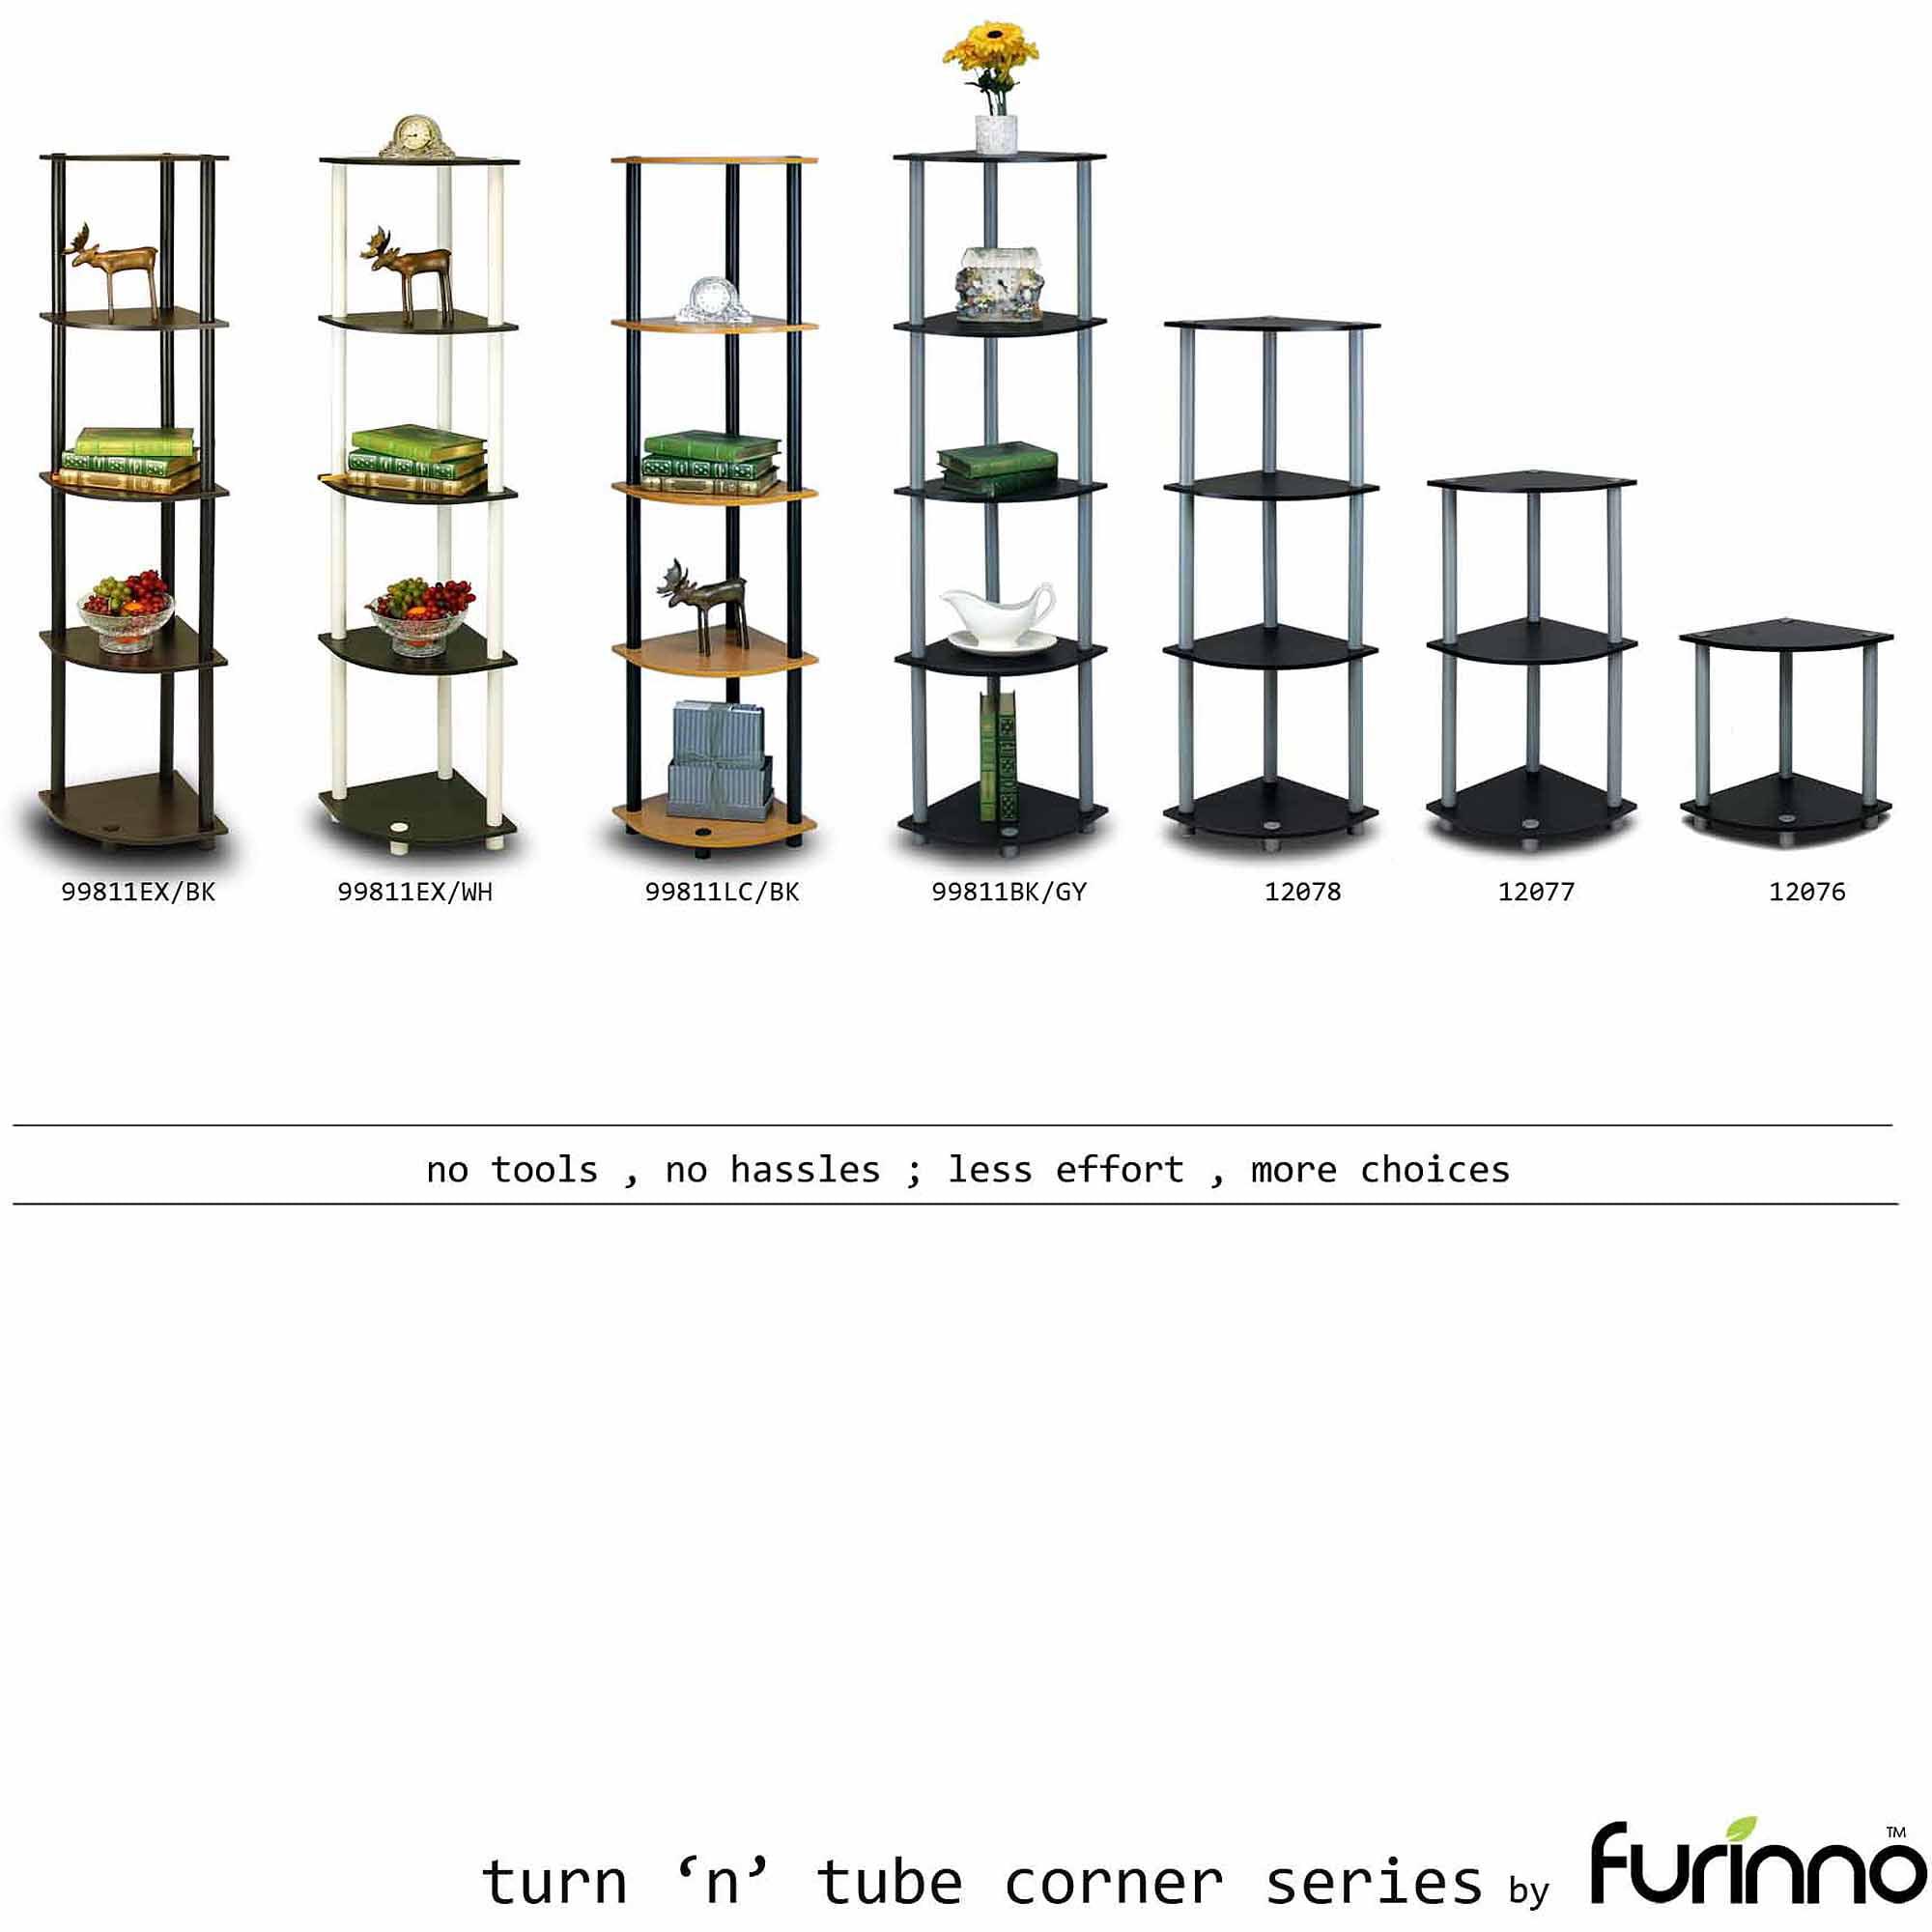 Furinno 99811 Turn-N-Tube 5-Tier Corner Display Rack Multipurpose Shelving Unit